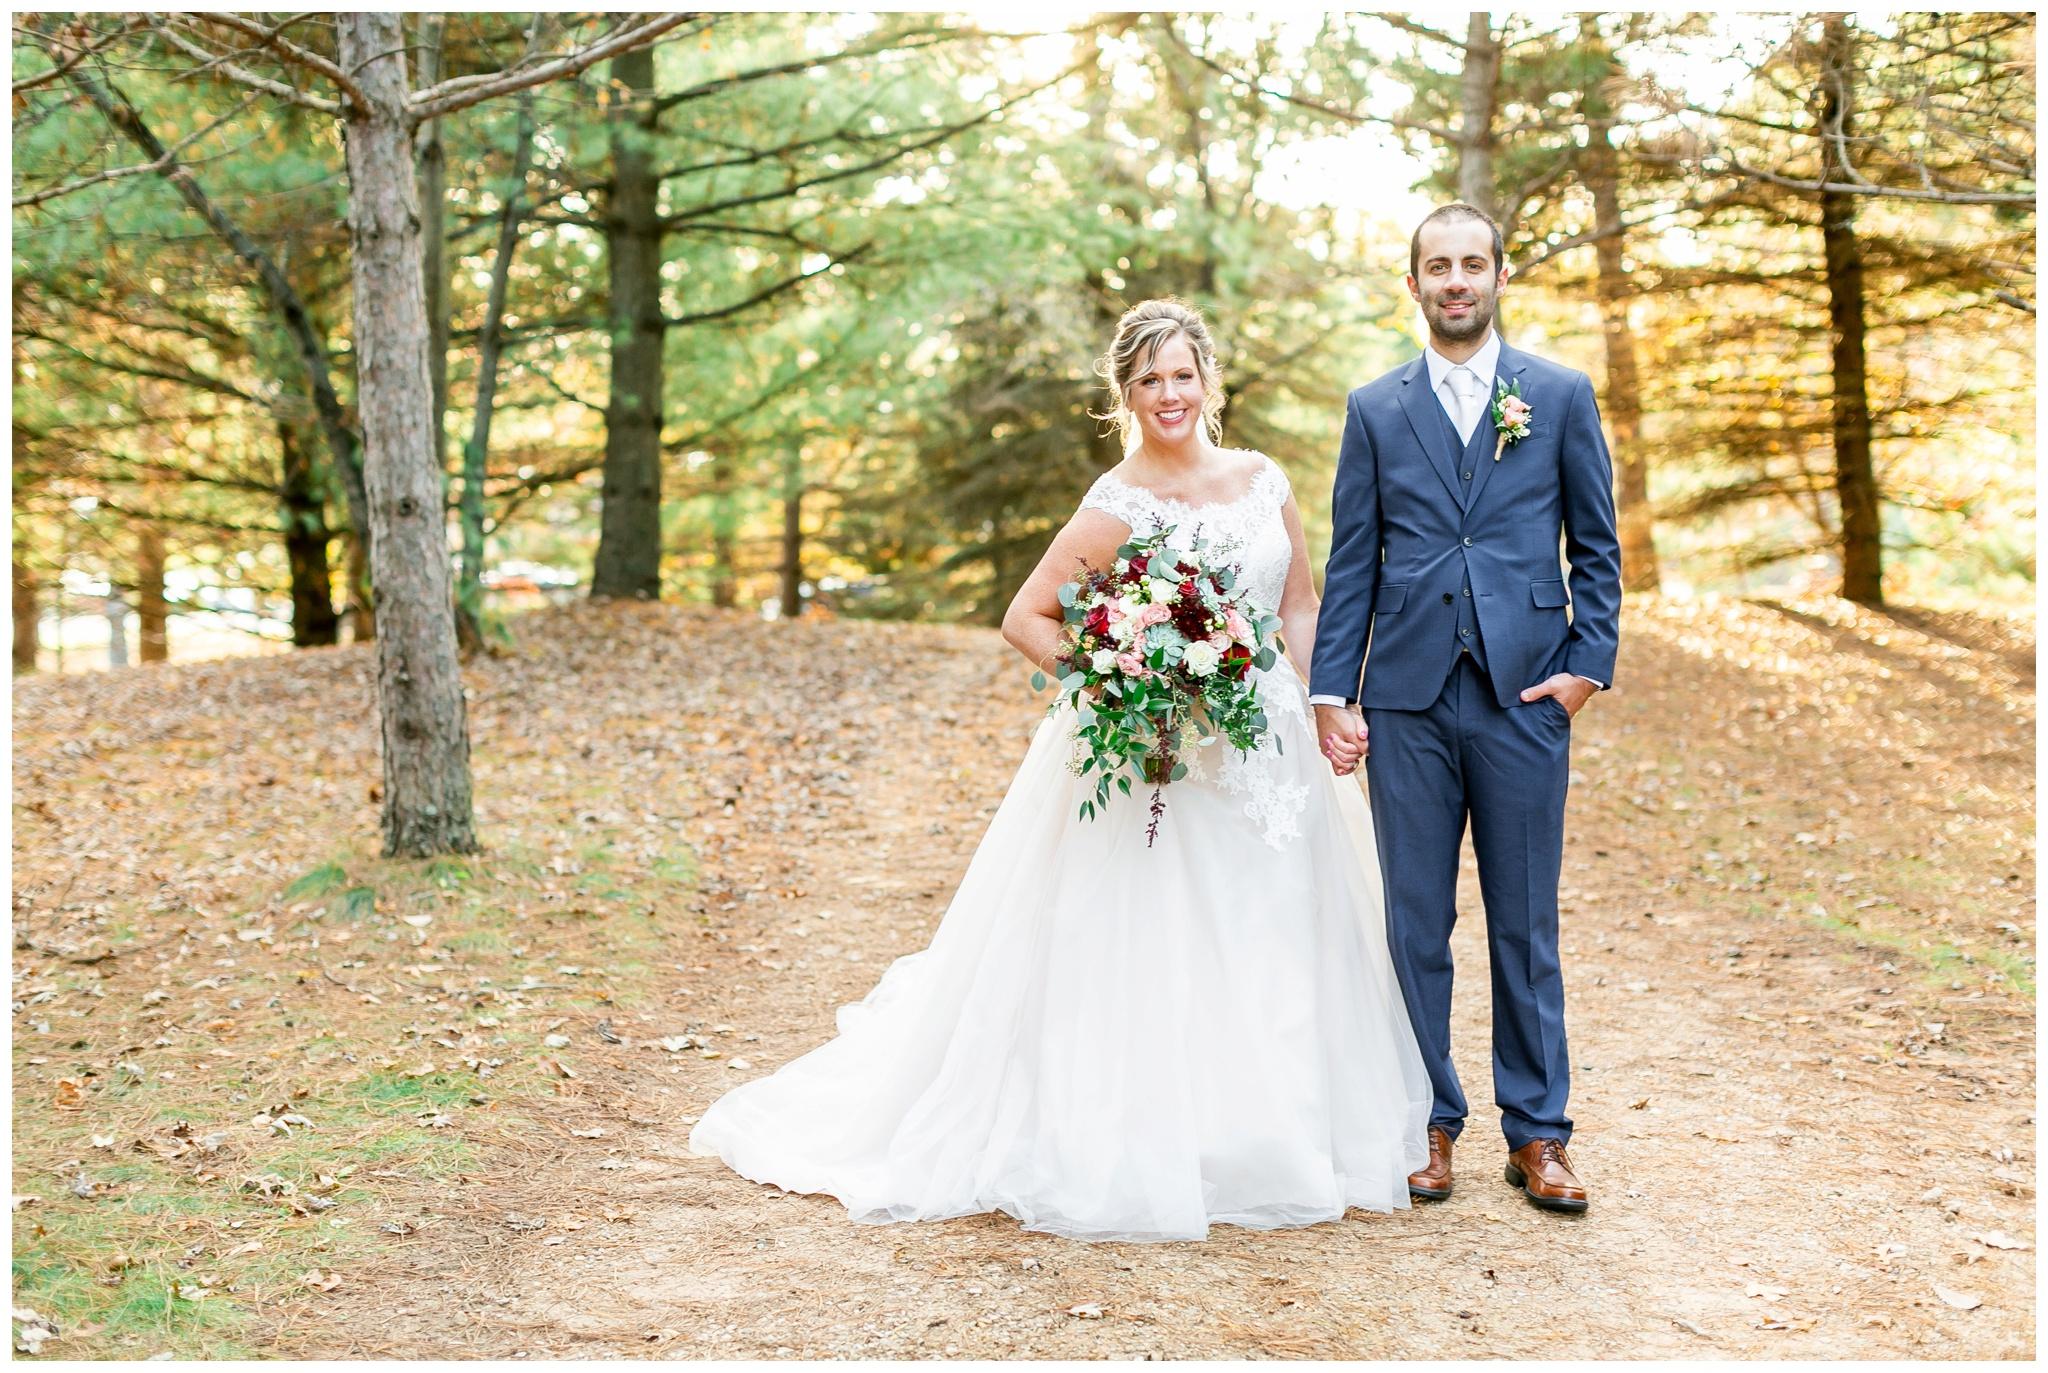 Shawano_County_park_Wedding_Caynay_Photo_Madison_Wi_2328.jpg